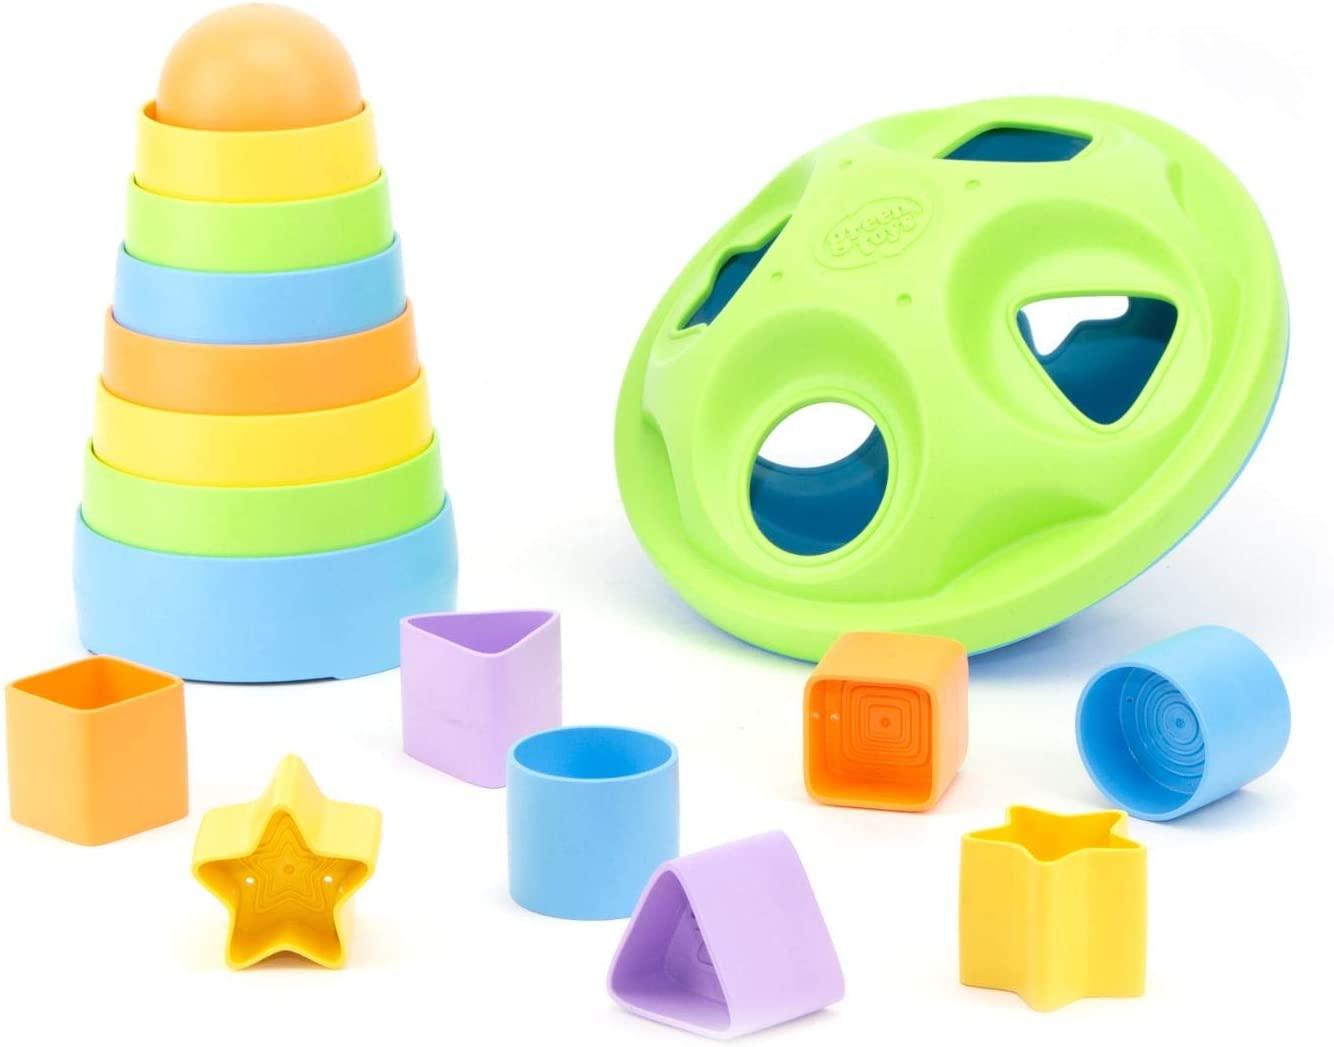 Green Toys Stacker & Shape Sorter Set $14.05 + Free Shipping w/ Prime or $25+